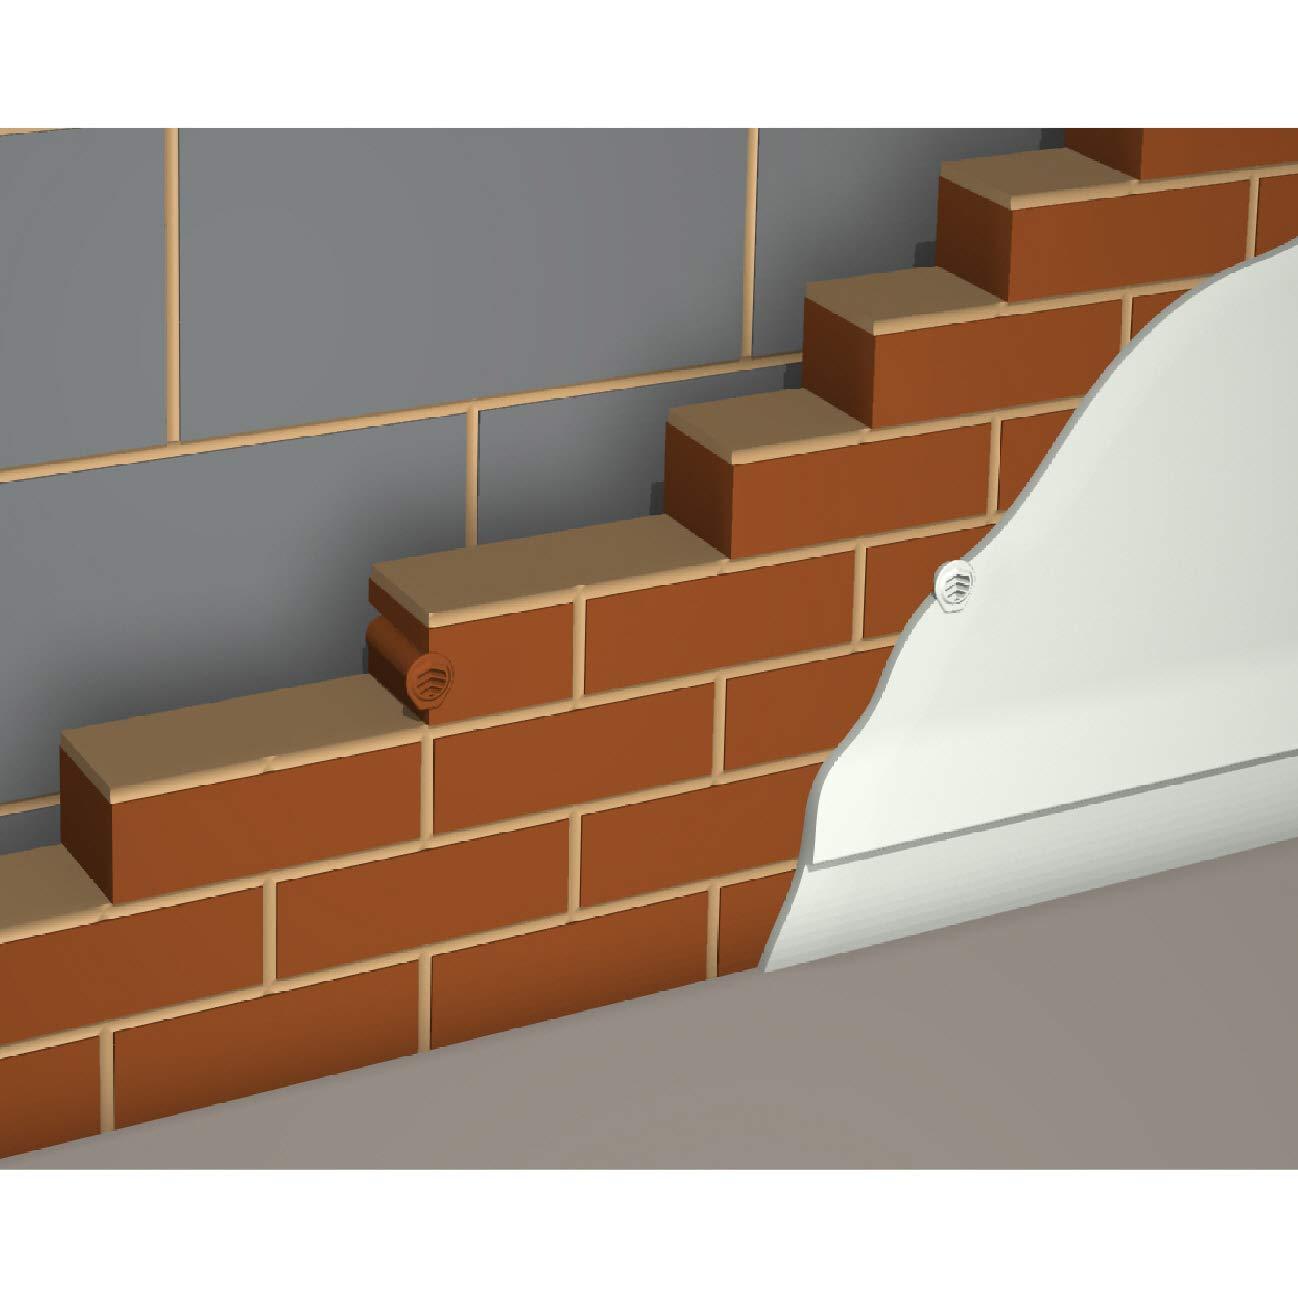 10 x Natural transparente nvdr timloc respiraderos sistema de ventilaci/ón redonda cavidad//pared muros de contenci/ón